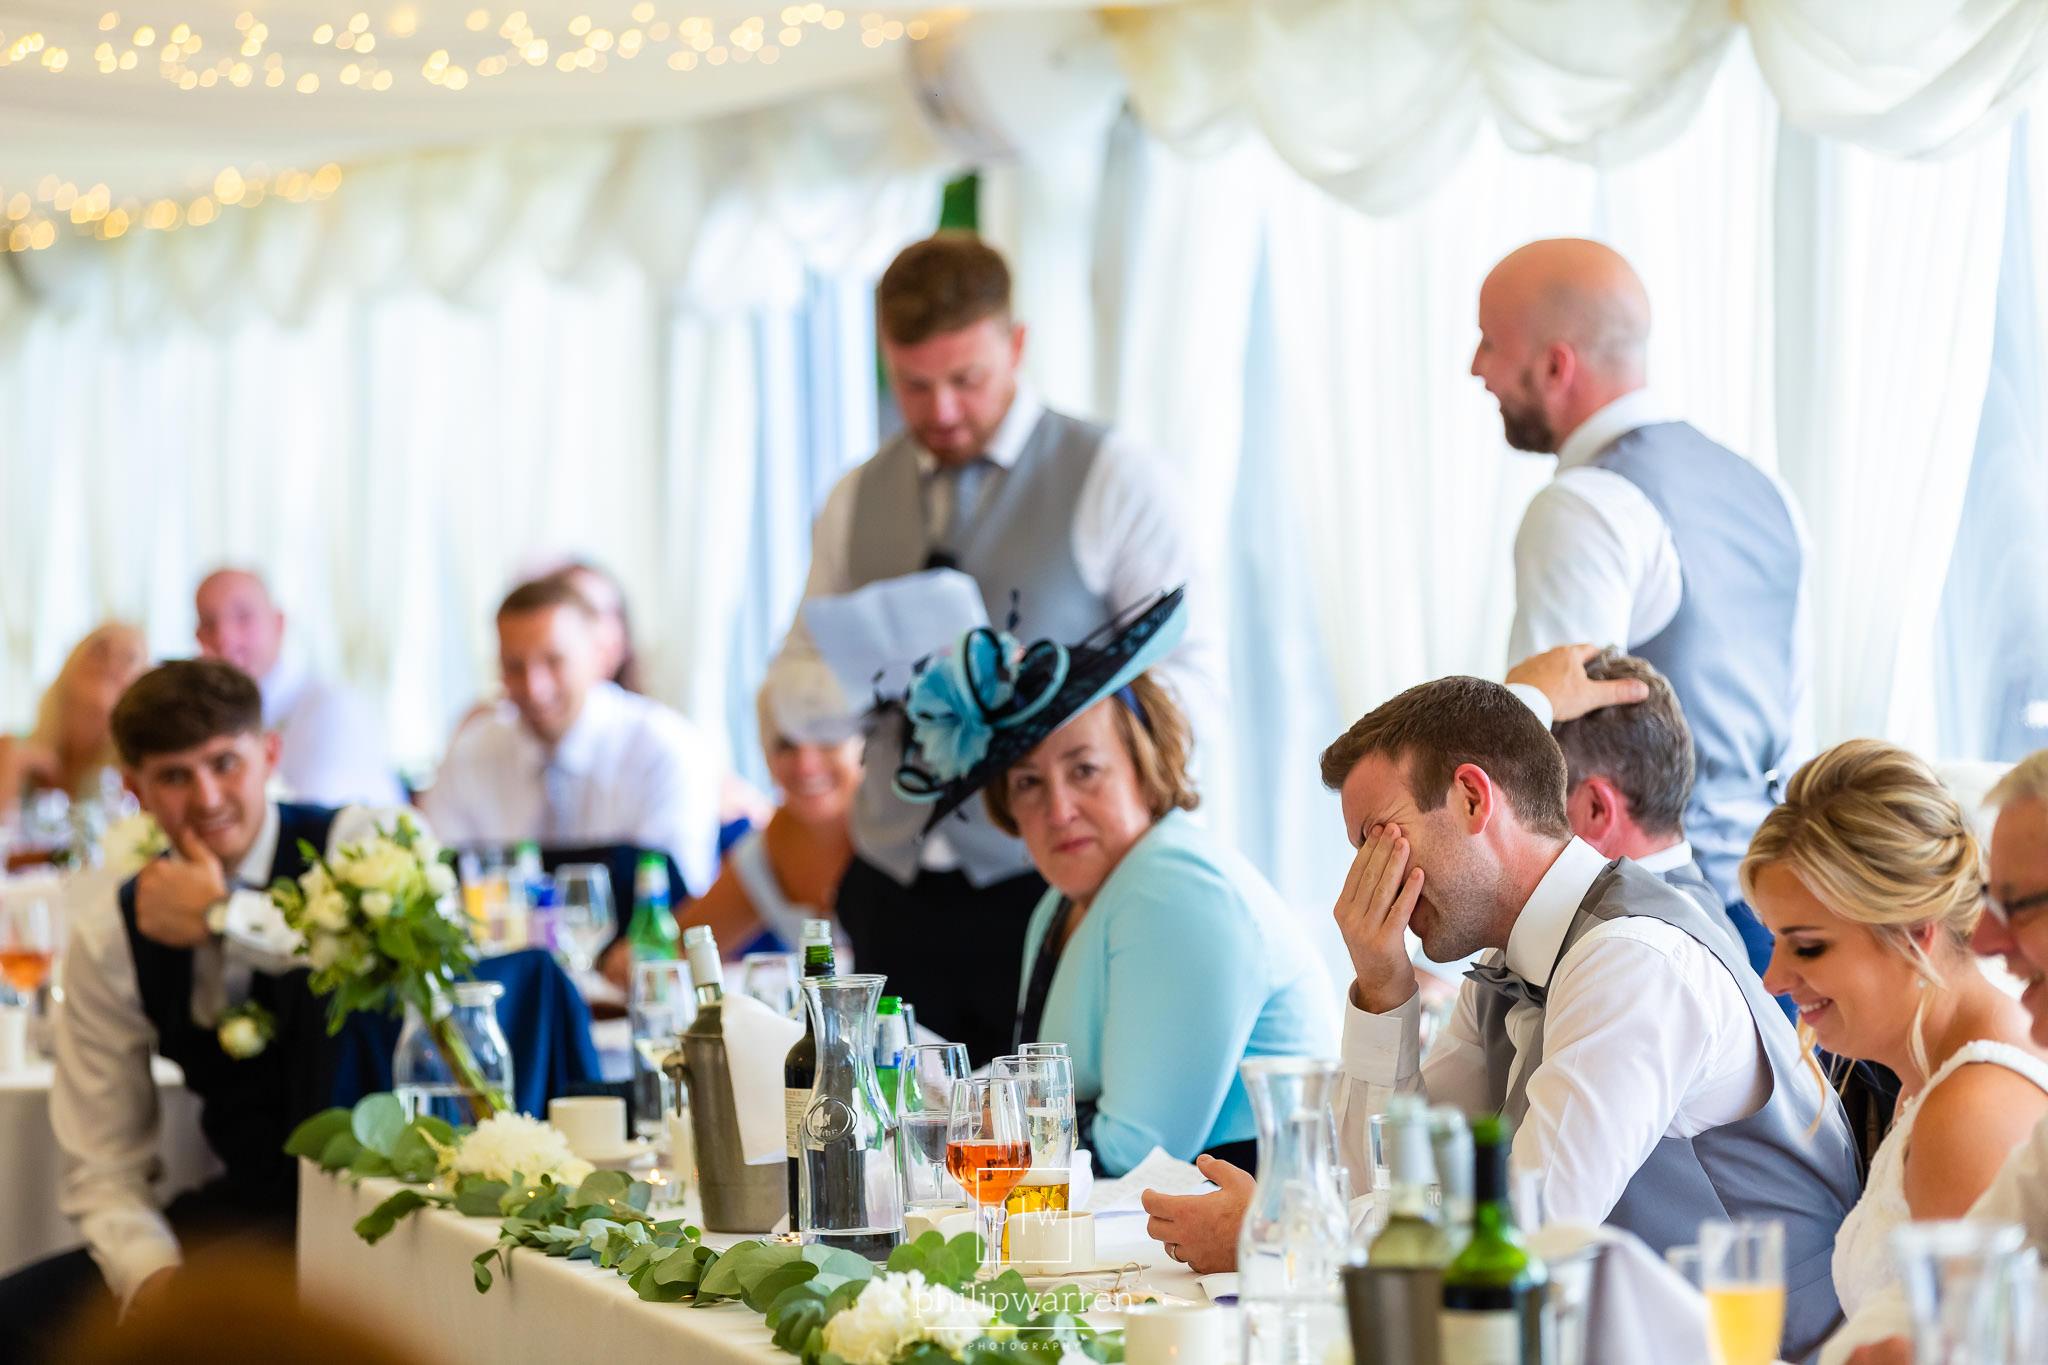 wedding photos at llanerch vineyard rachel + craig-11.jpg